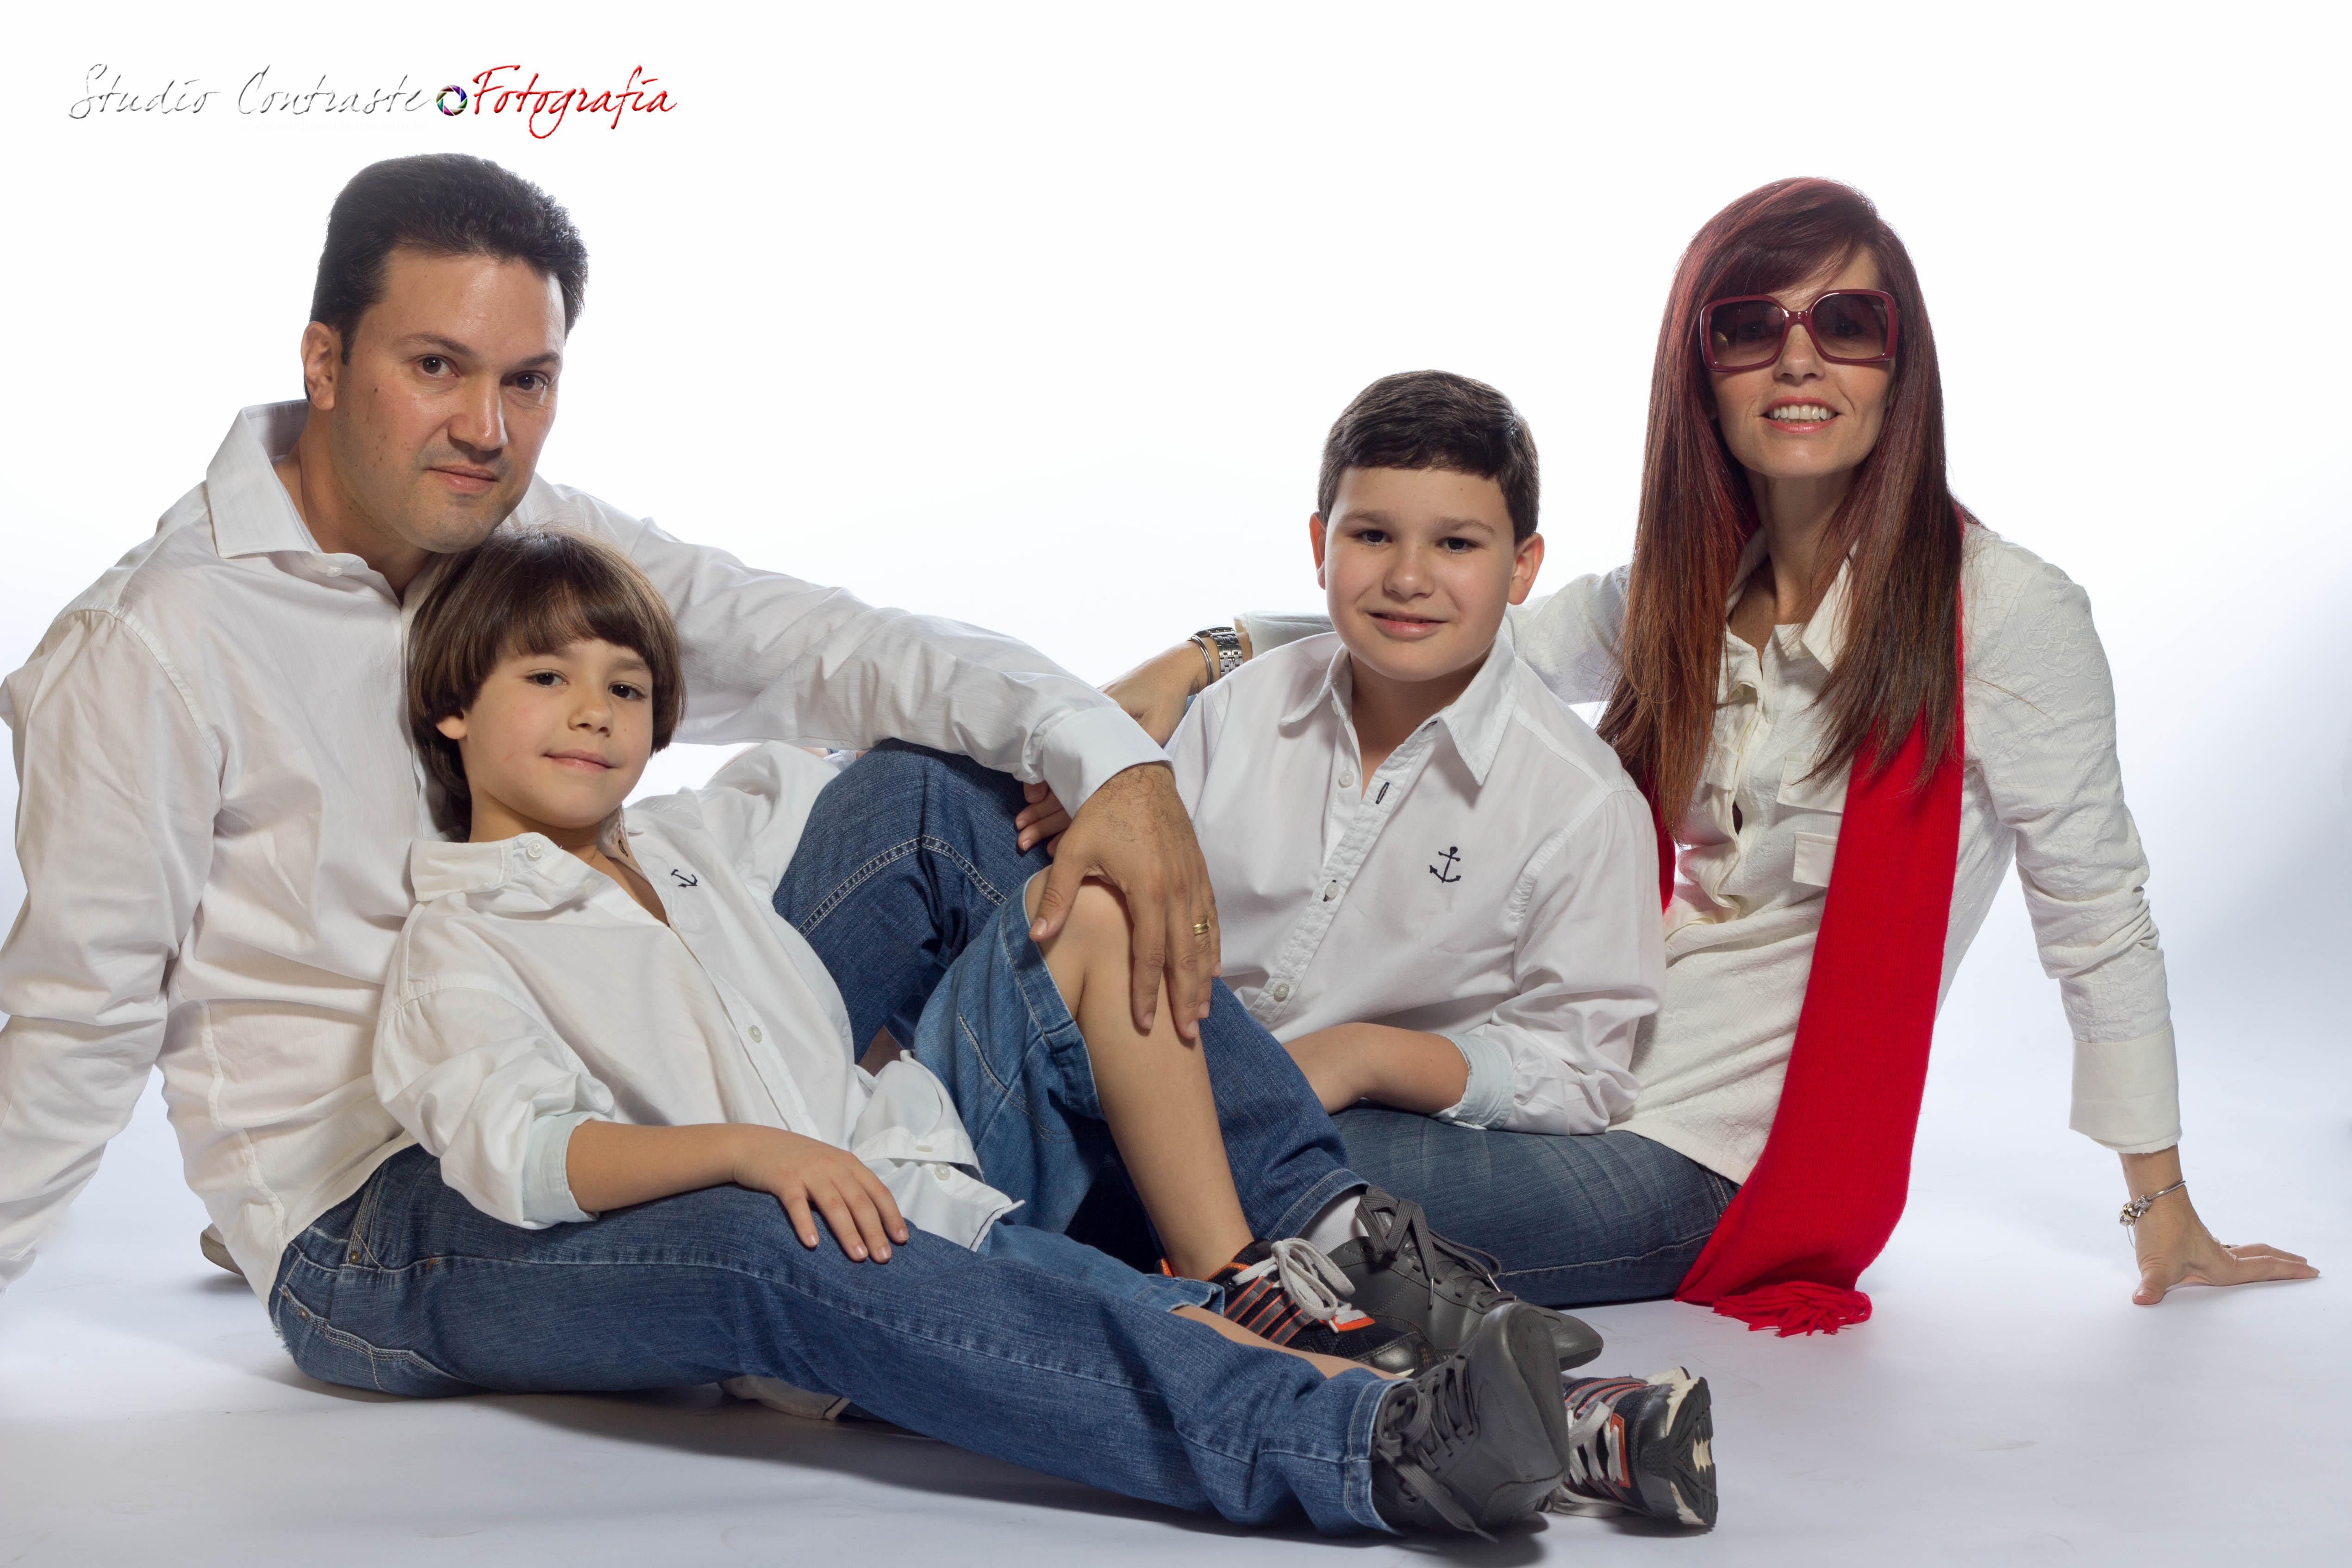 Arthur & família